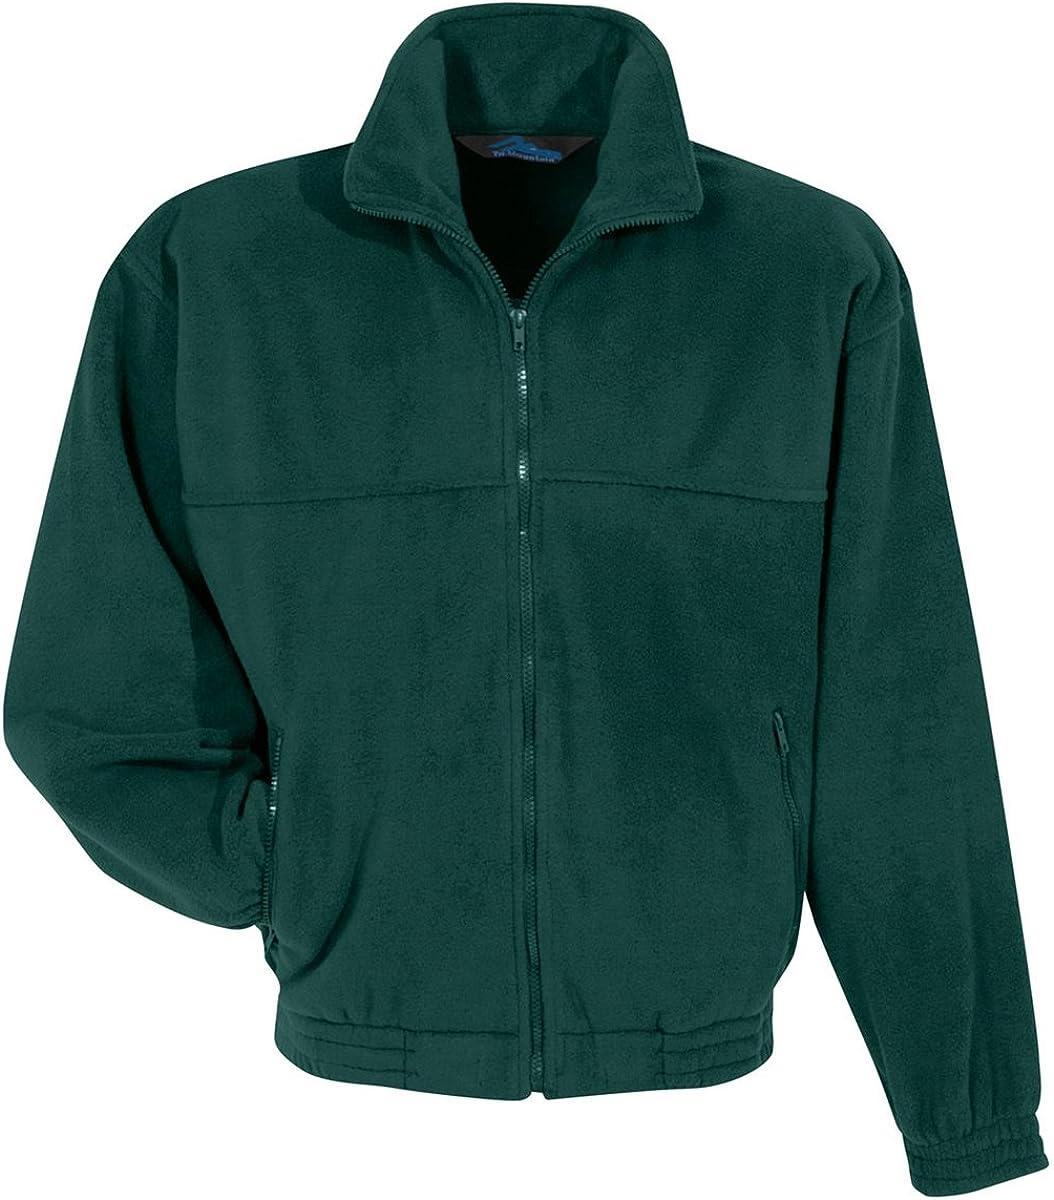 Tri-Mountain Fleece 7600 Tundra 10.5 oz. Heavyweight 100% Spun Polyester Forest Green